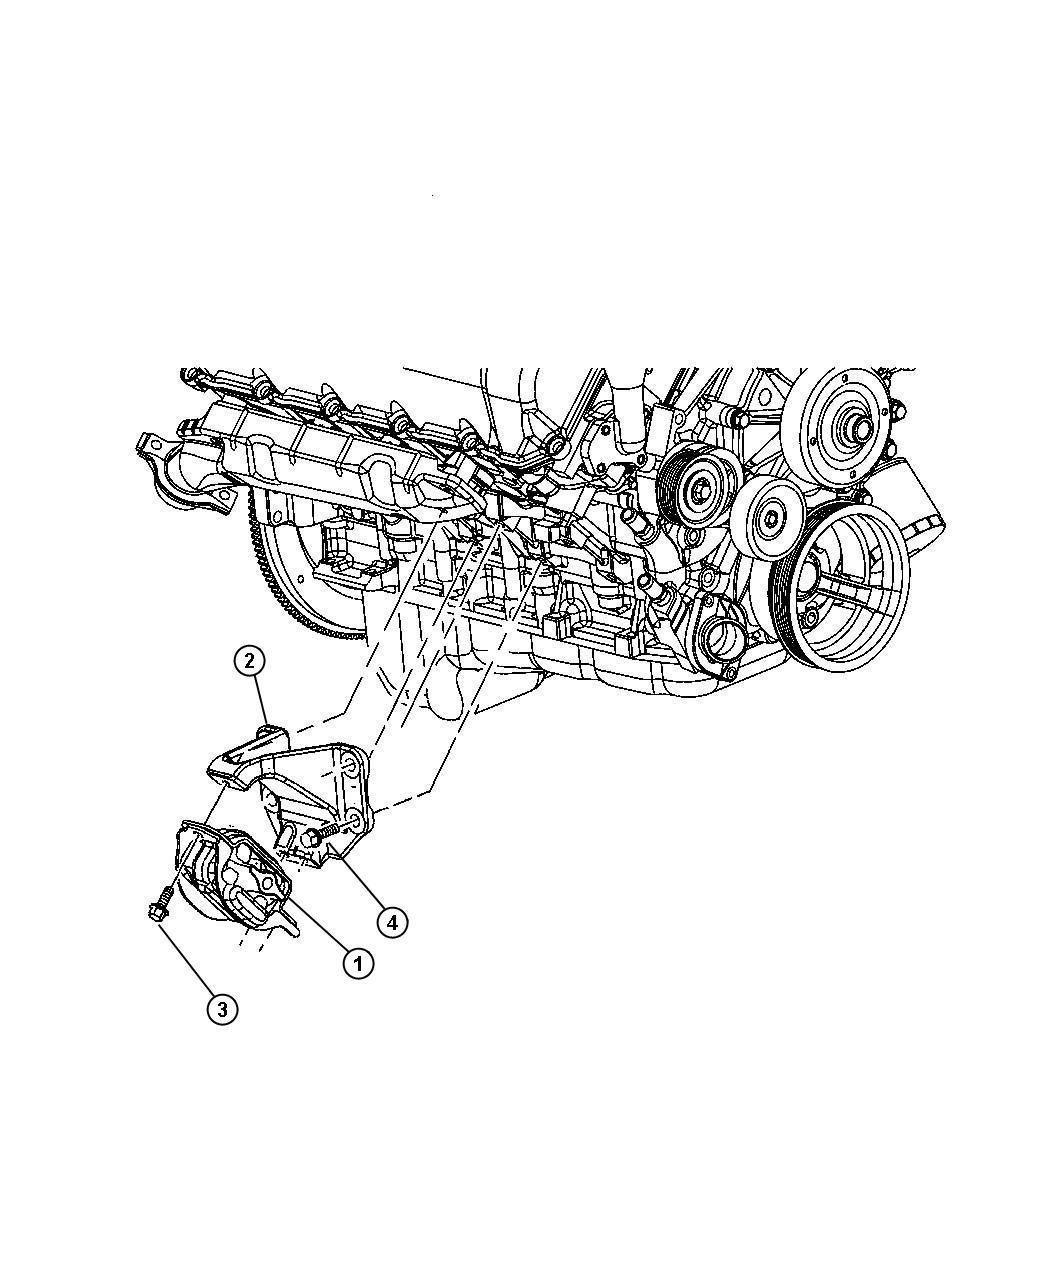 tags: #5#2001 dodge ram 2500 engine#dodge ram 2500 engine#4#2001 dodge ram  engine layout#new 5#dodge 2002 5#9 liter v8 engine#2001 dodge ram engines# dodge